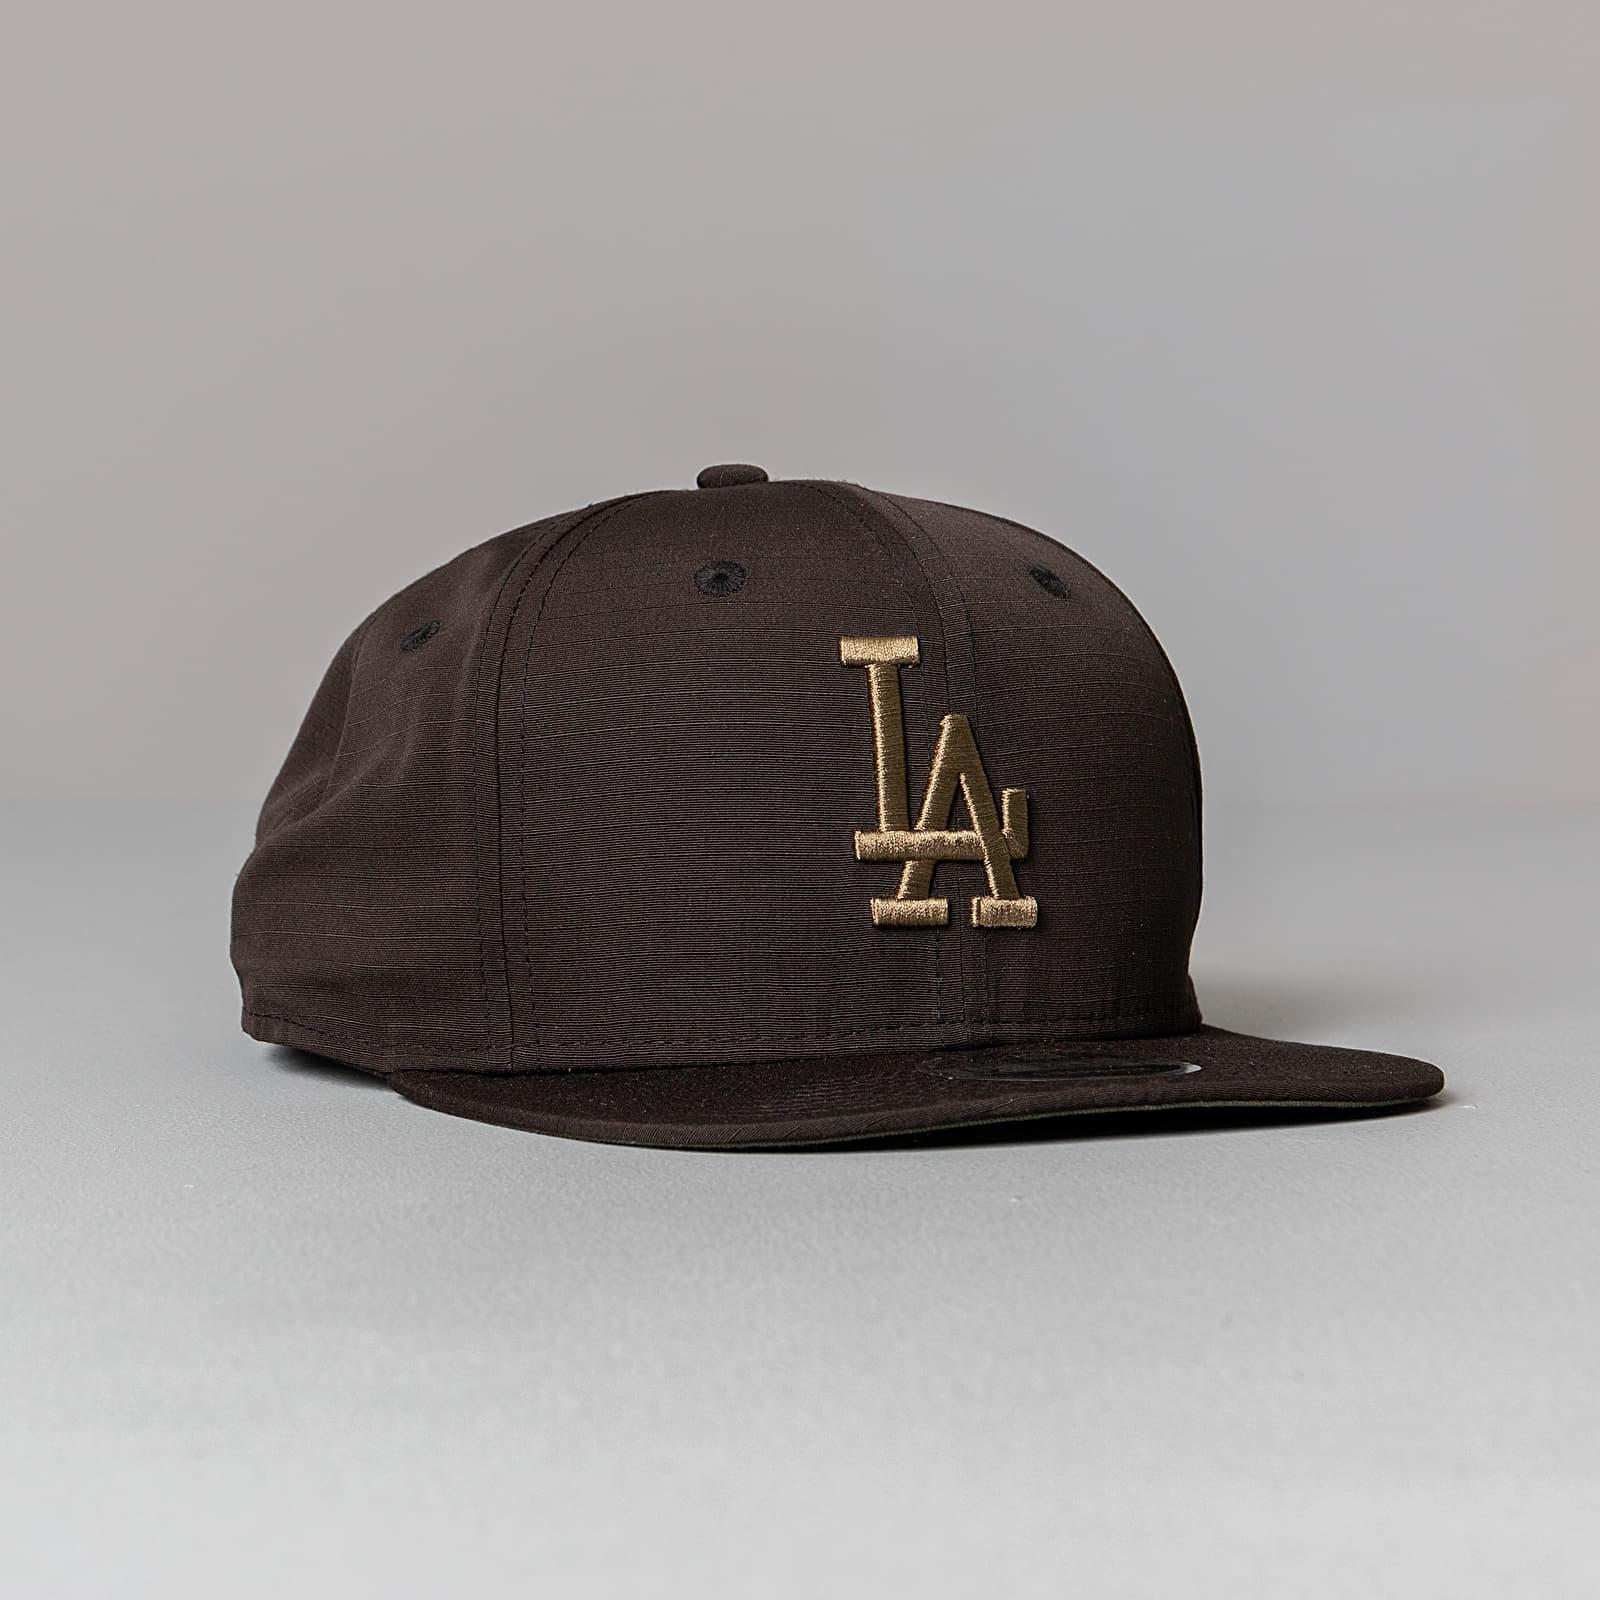 New Era 9Fifty MLB Utility Los Angeles Dodgers Cap